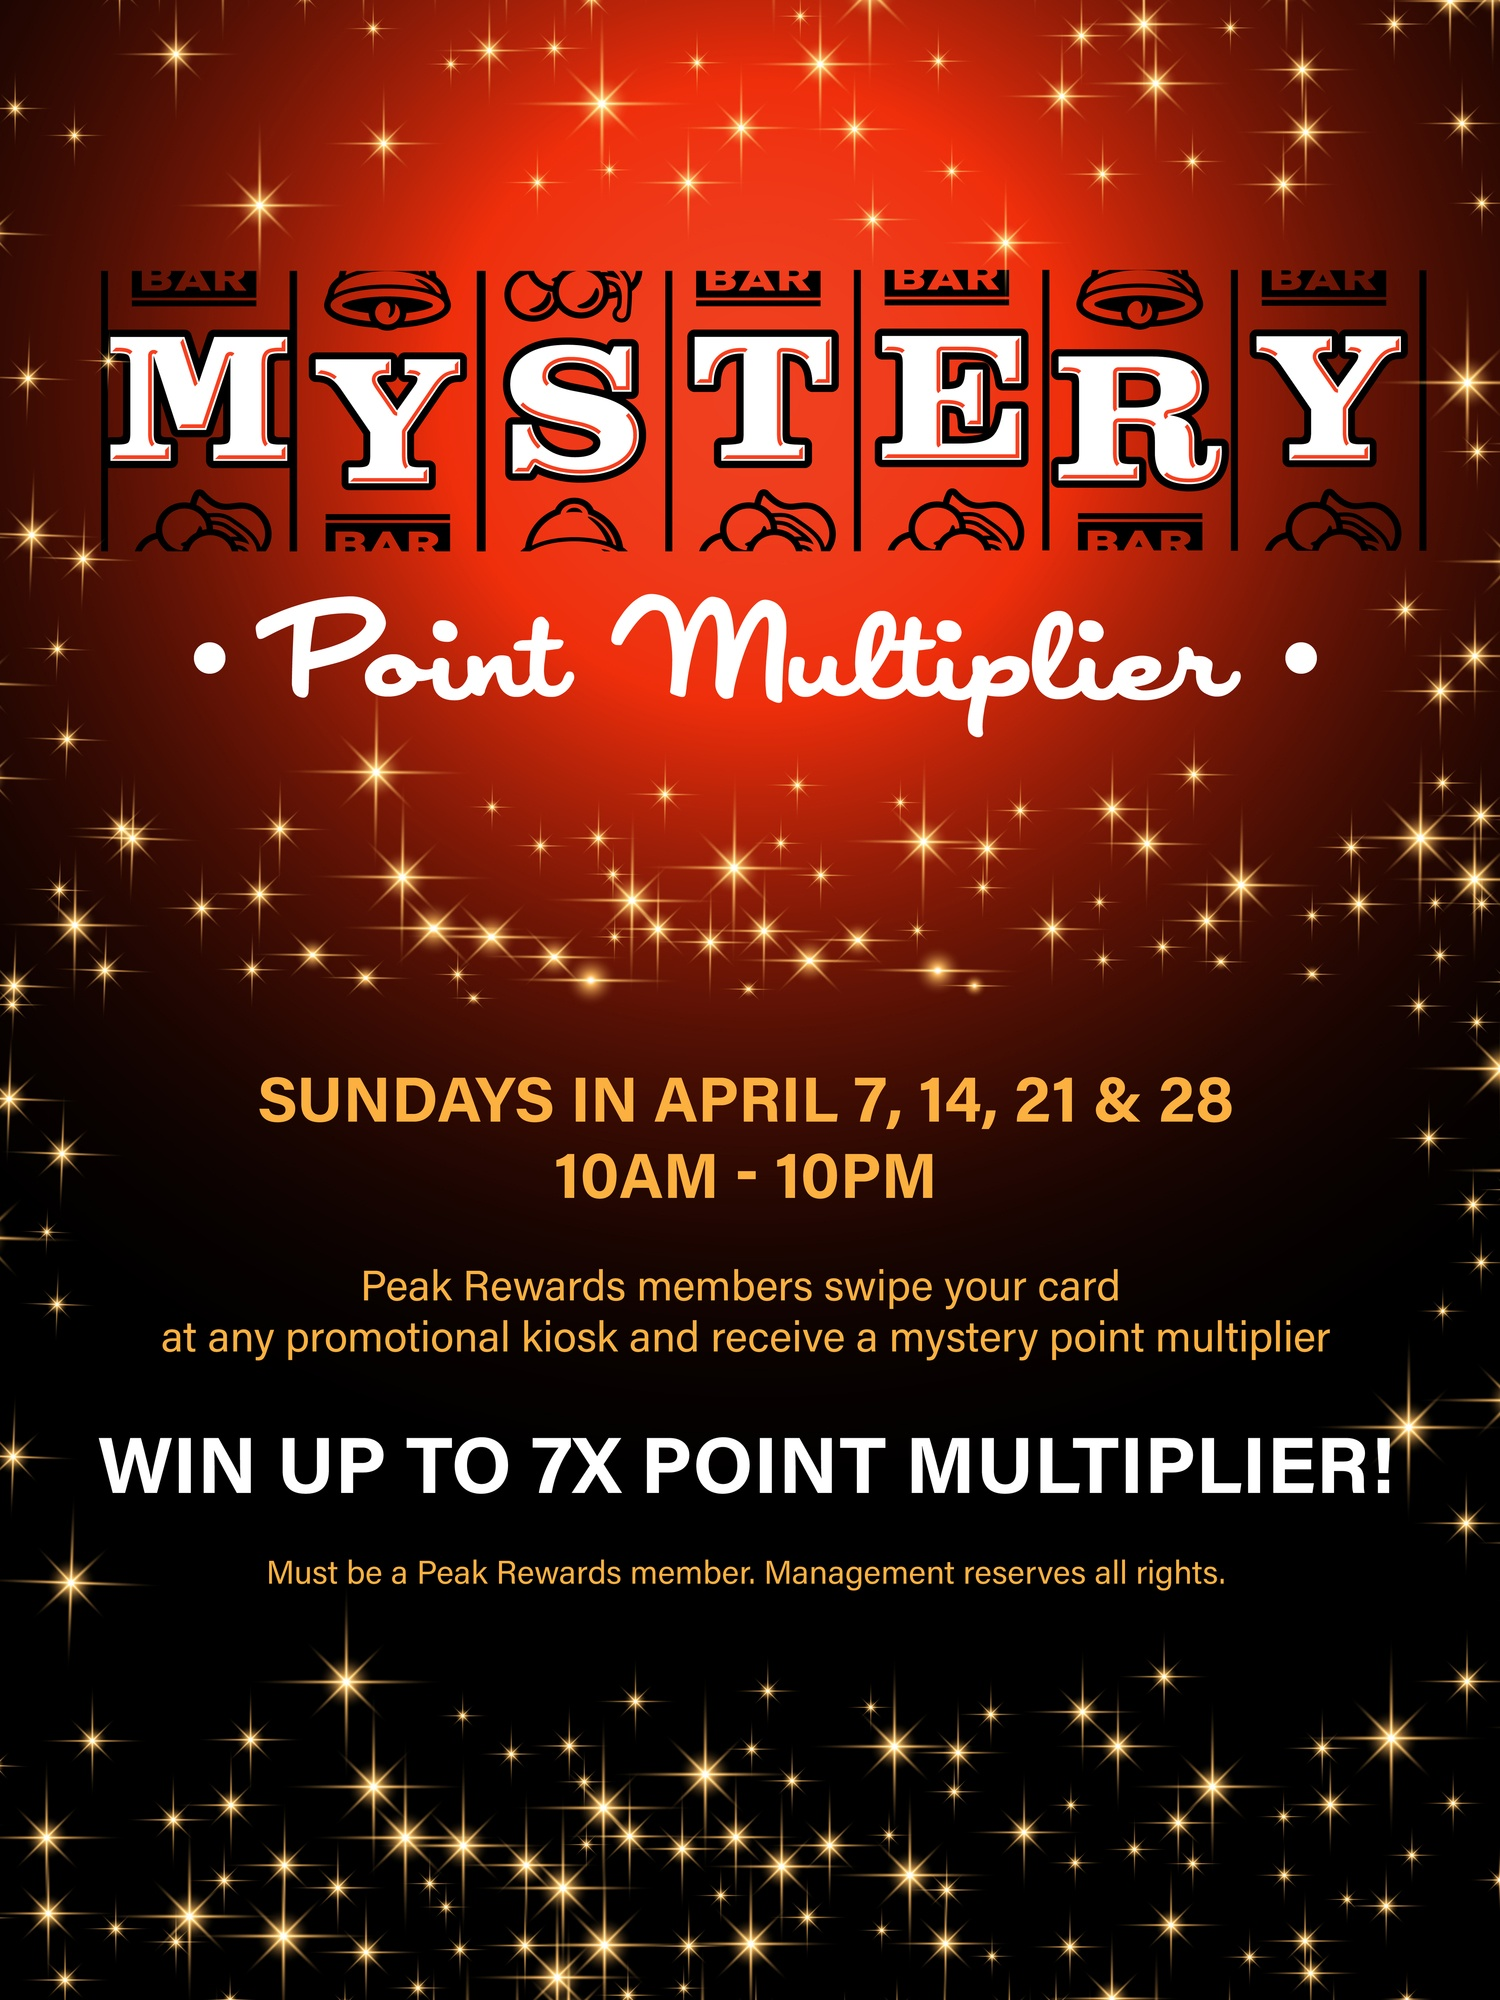 Mystery Point Multiplier Players Club Peak Rewards